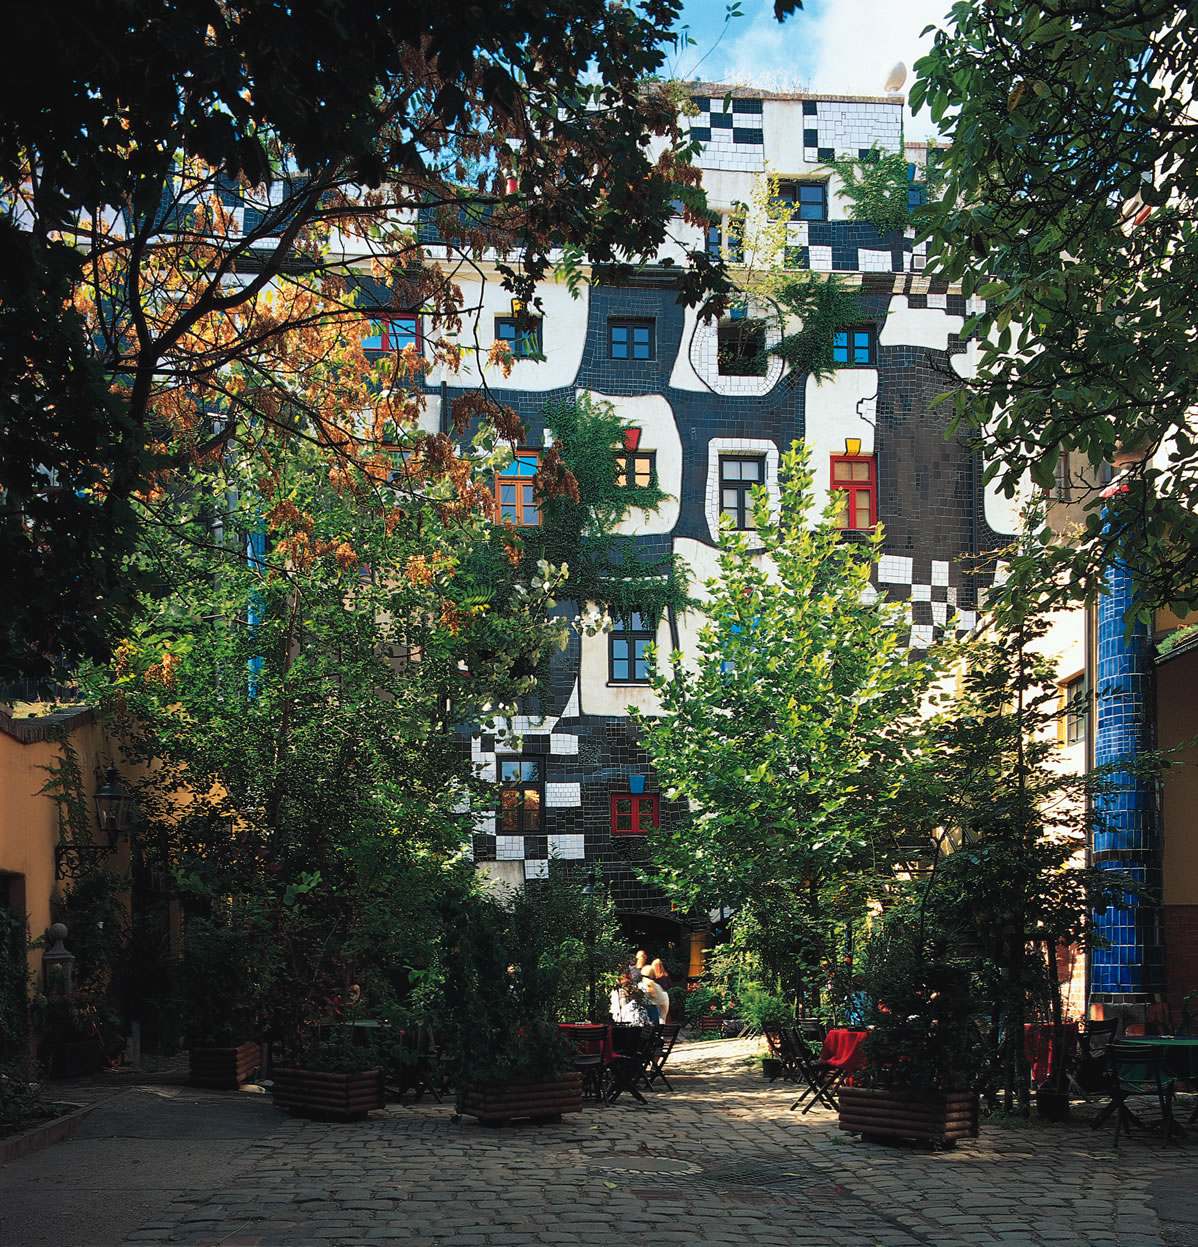 Friedensreich regentag dunkelbunt hundertwasser orna for Architecture hundertwasser